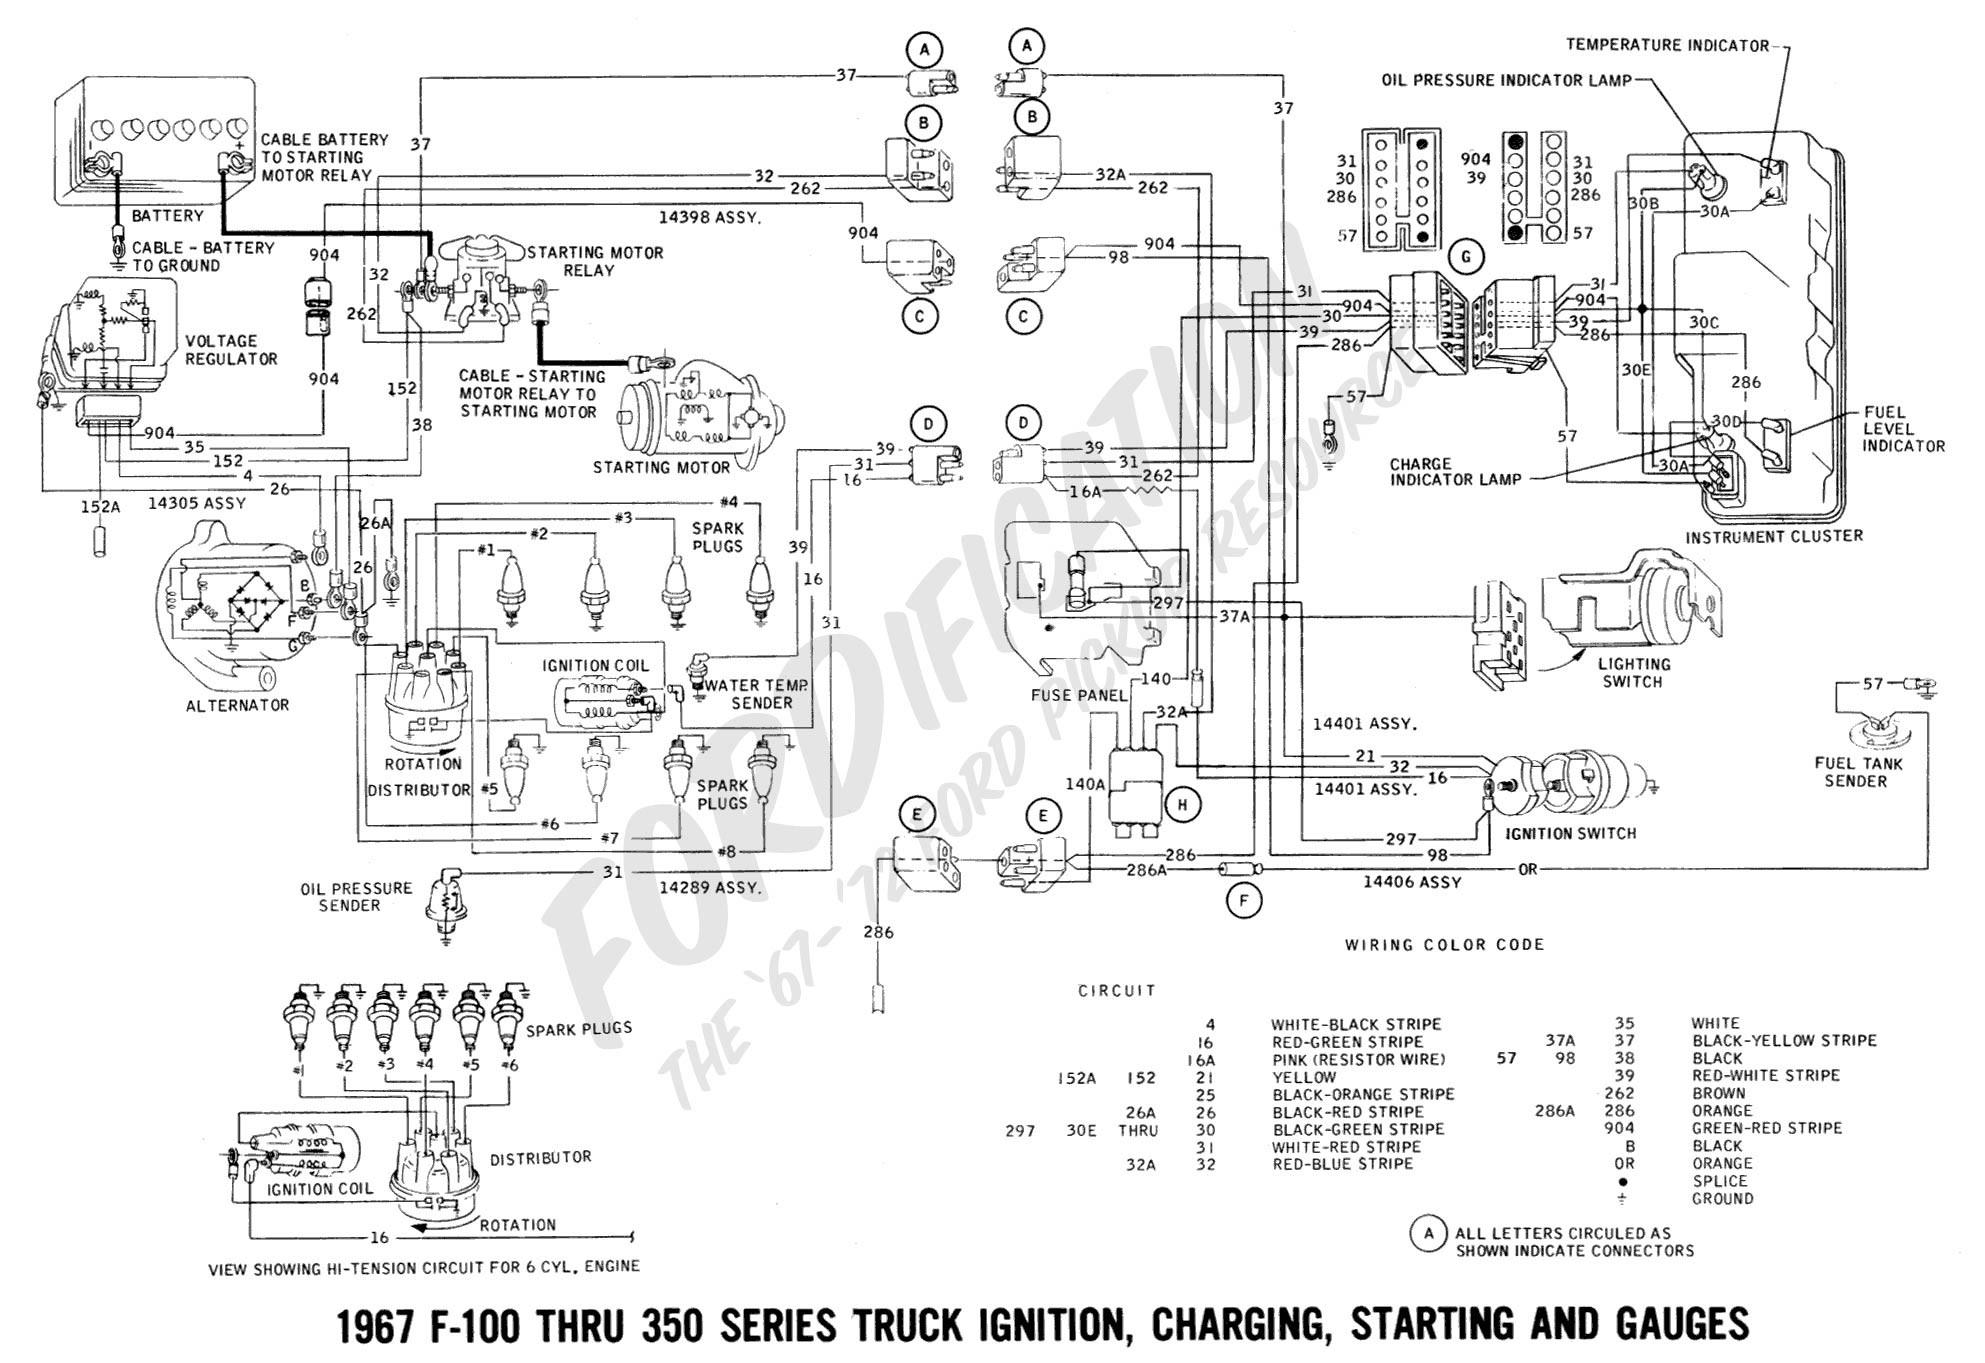 ford f 250 4x4 wiring